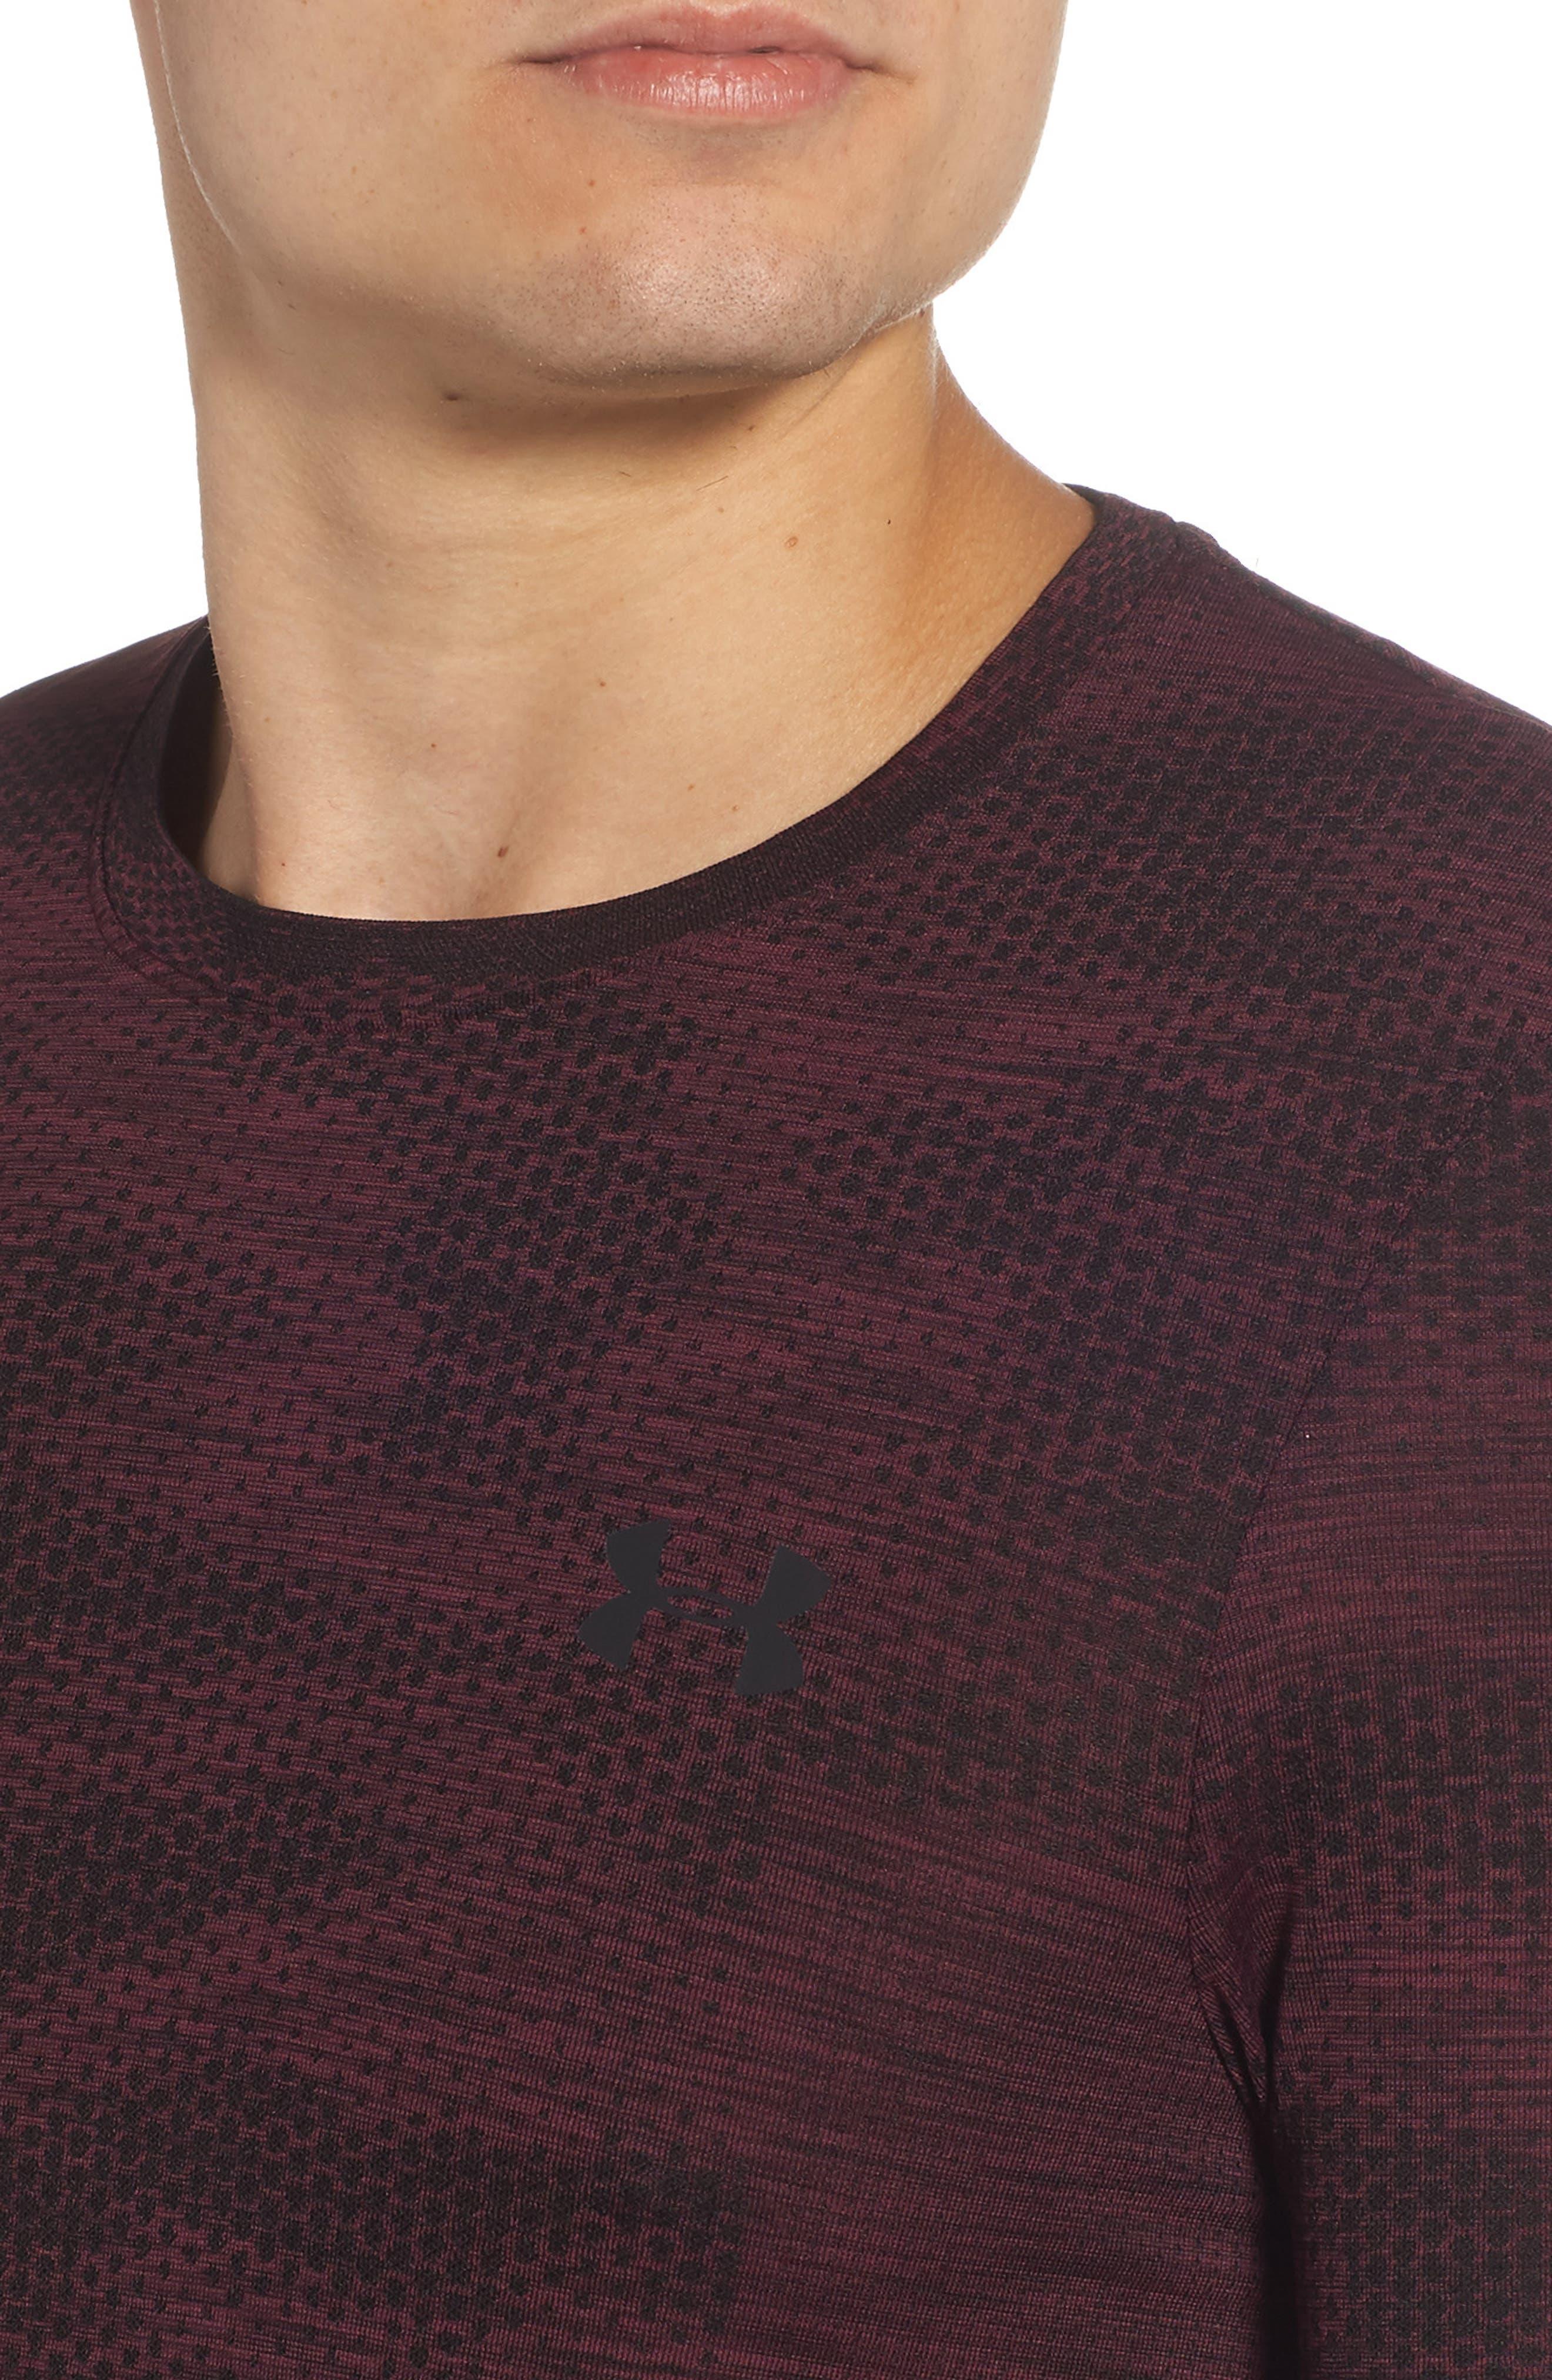 Siphon Camo Print Performance T-Shirt,                             Alternate thumbnail 4, color,                             DARK MAROON